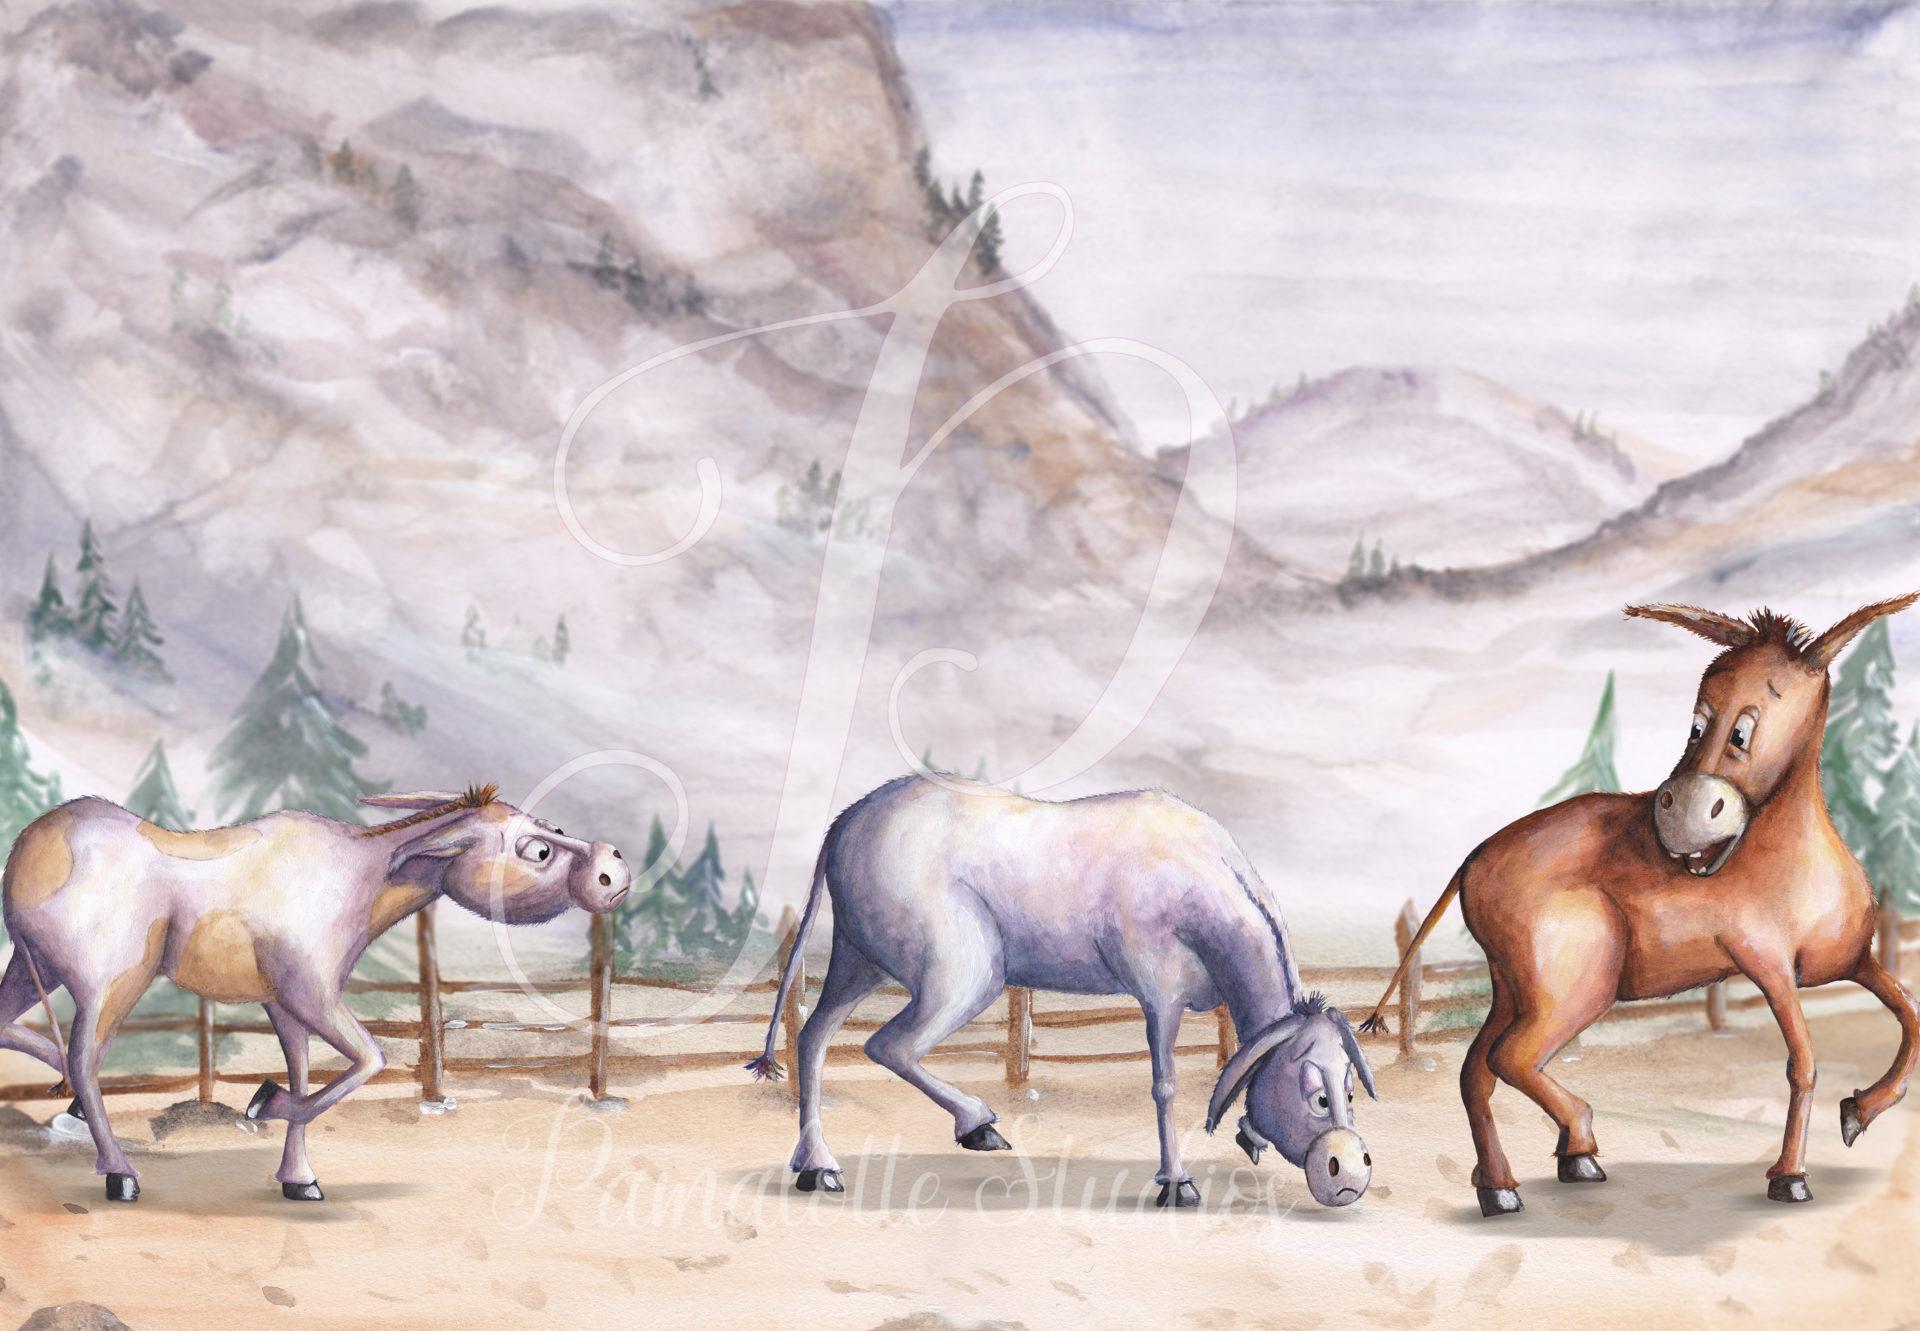 6 - Donkey Adventure